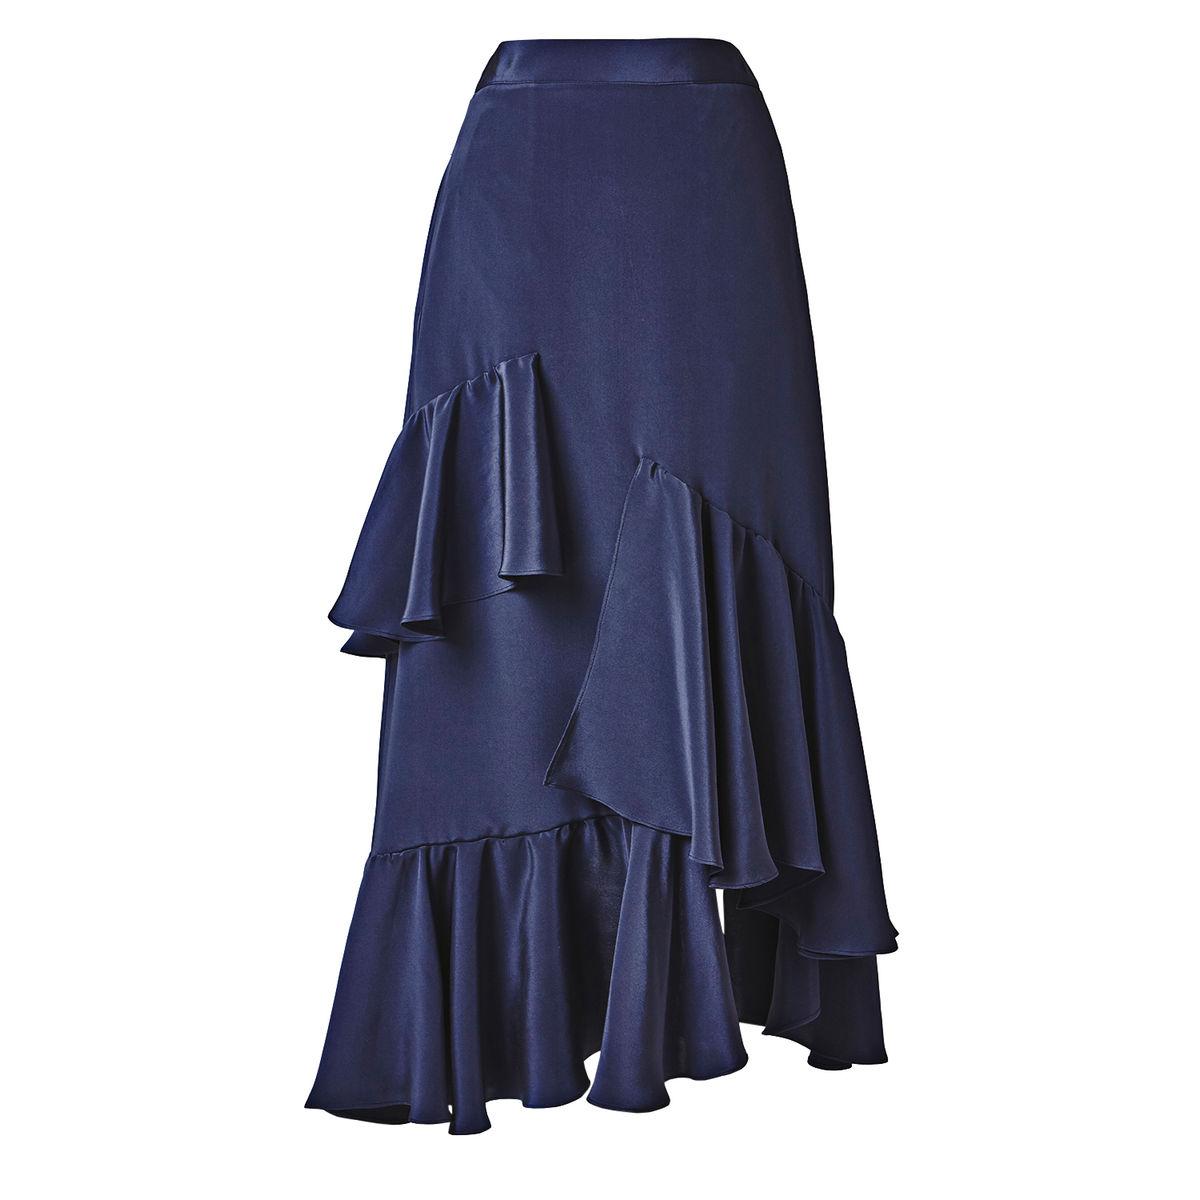 Mouth harmonious silk ruffle skirt want lick